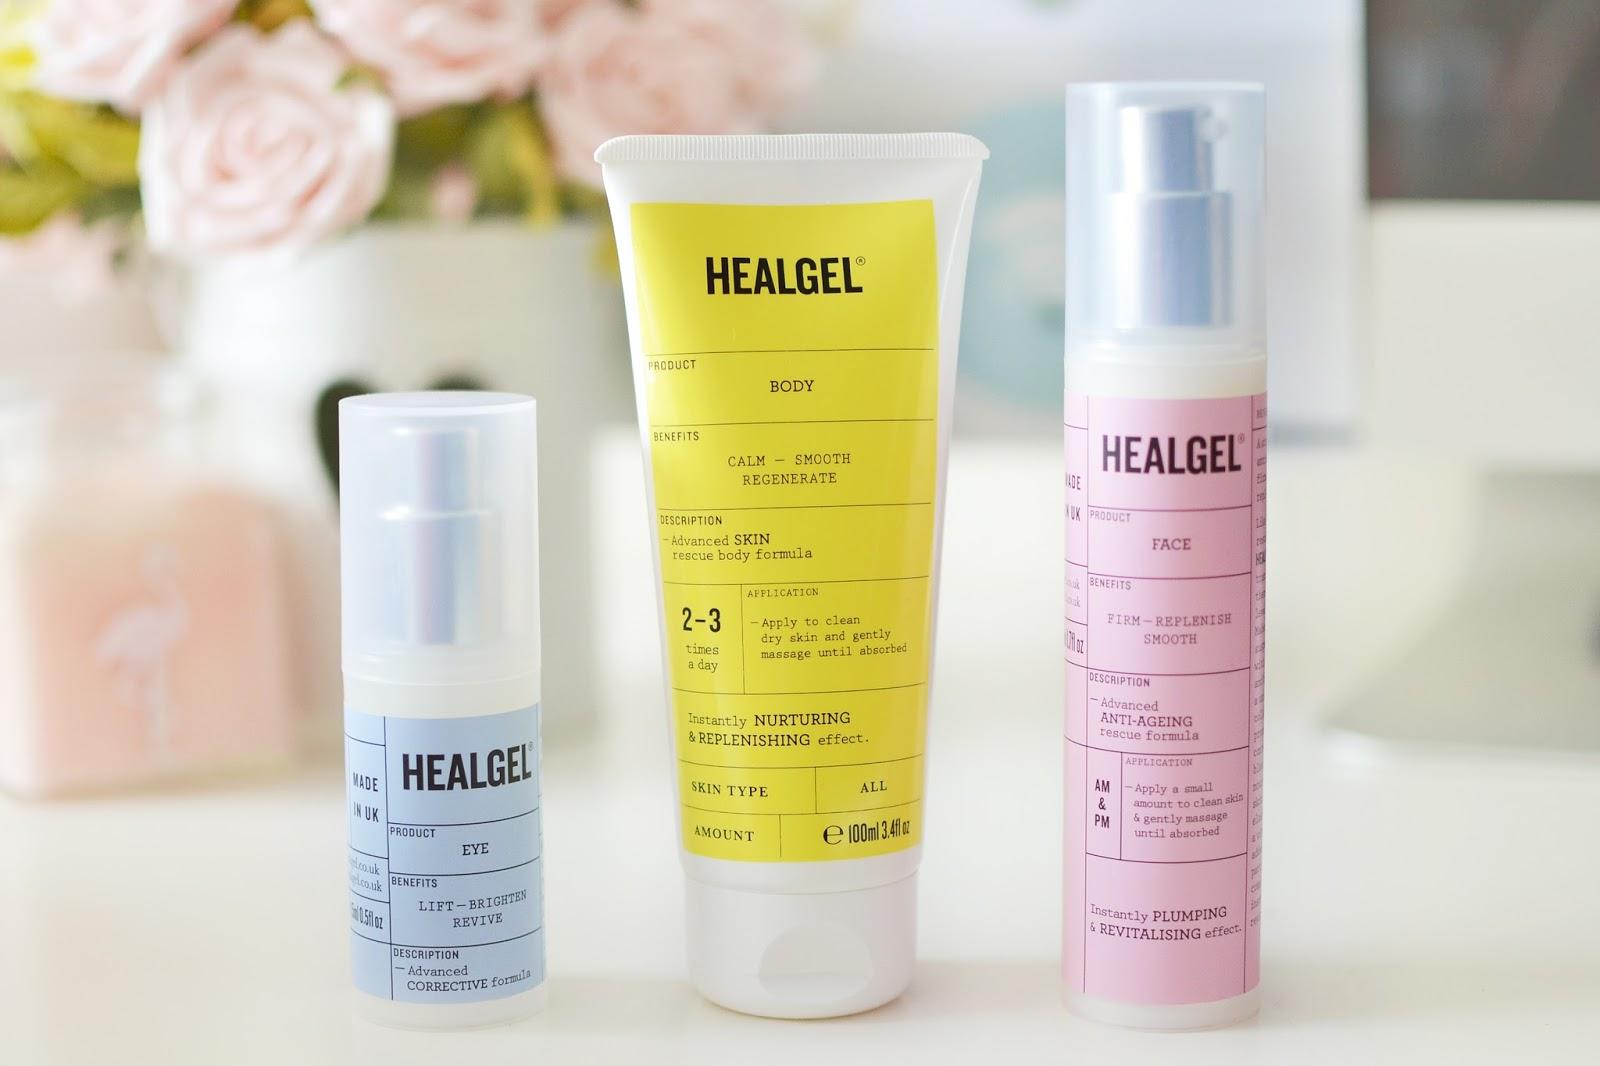 HealGel Body, bodycare for dry skin, products for dry skin, healgel